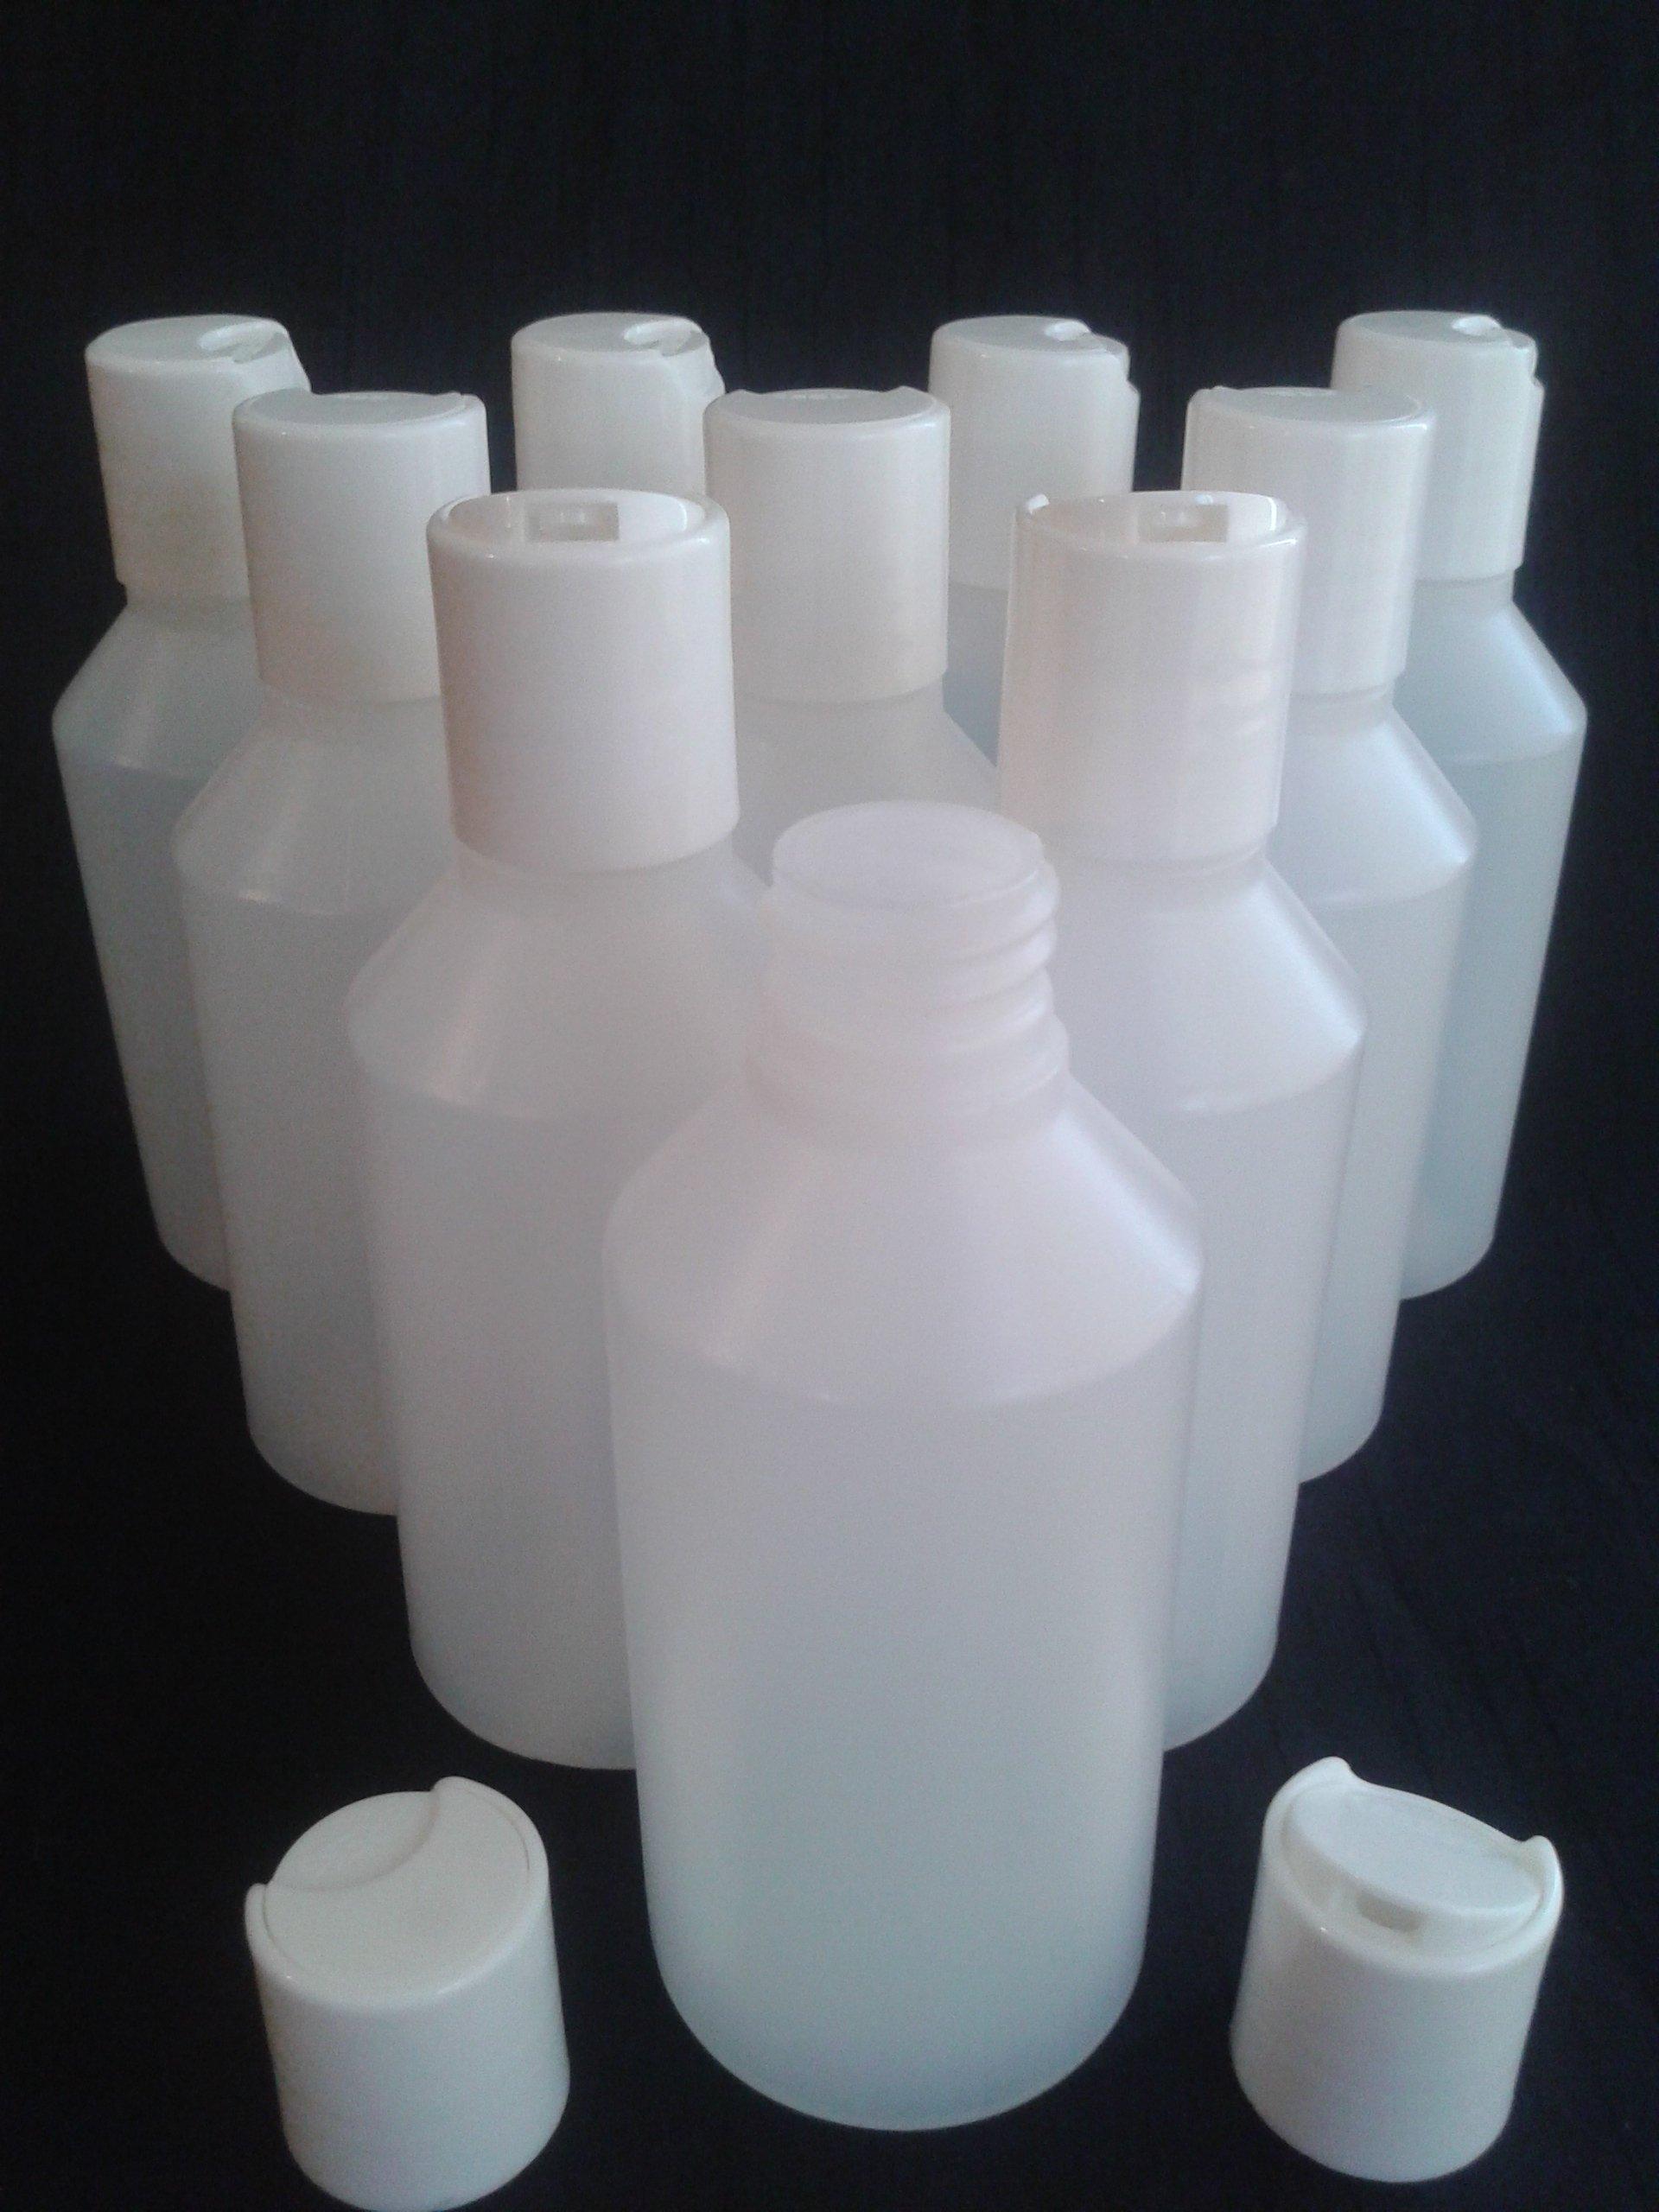 10 x 250 ml empty plastic bottles + disc top lid Ideal craft / cosmetics / travel by Body Art Desire